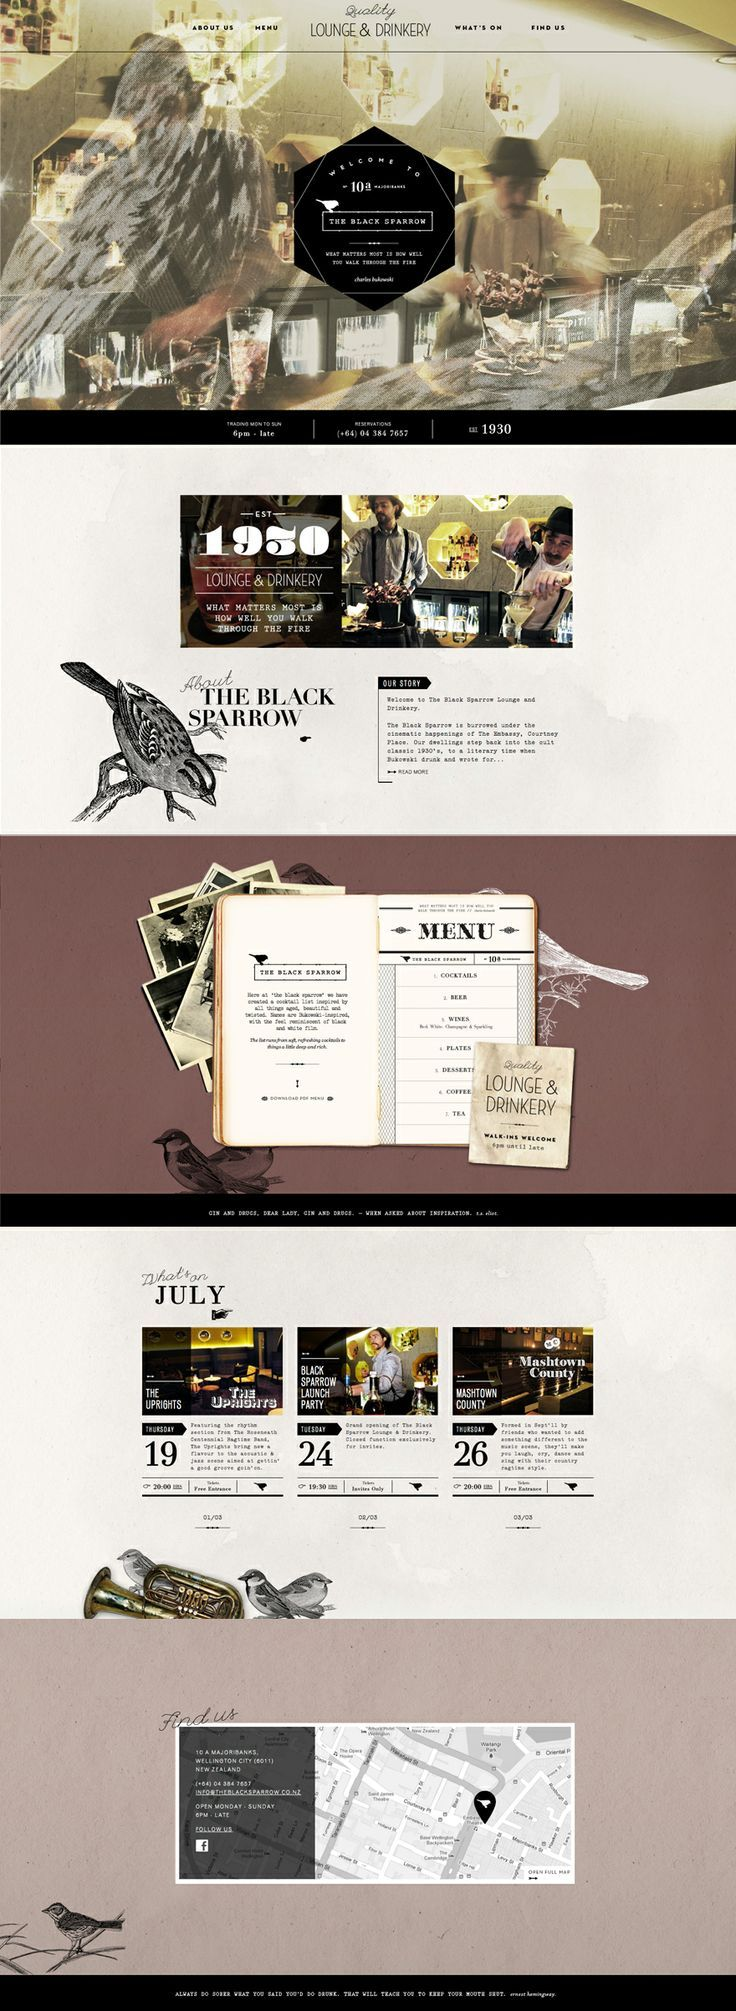 The Black Sparrow. Classic occasion. #webdesign (More design inspiration at www.aldenchong.com)